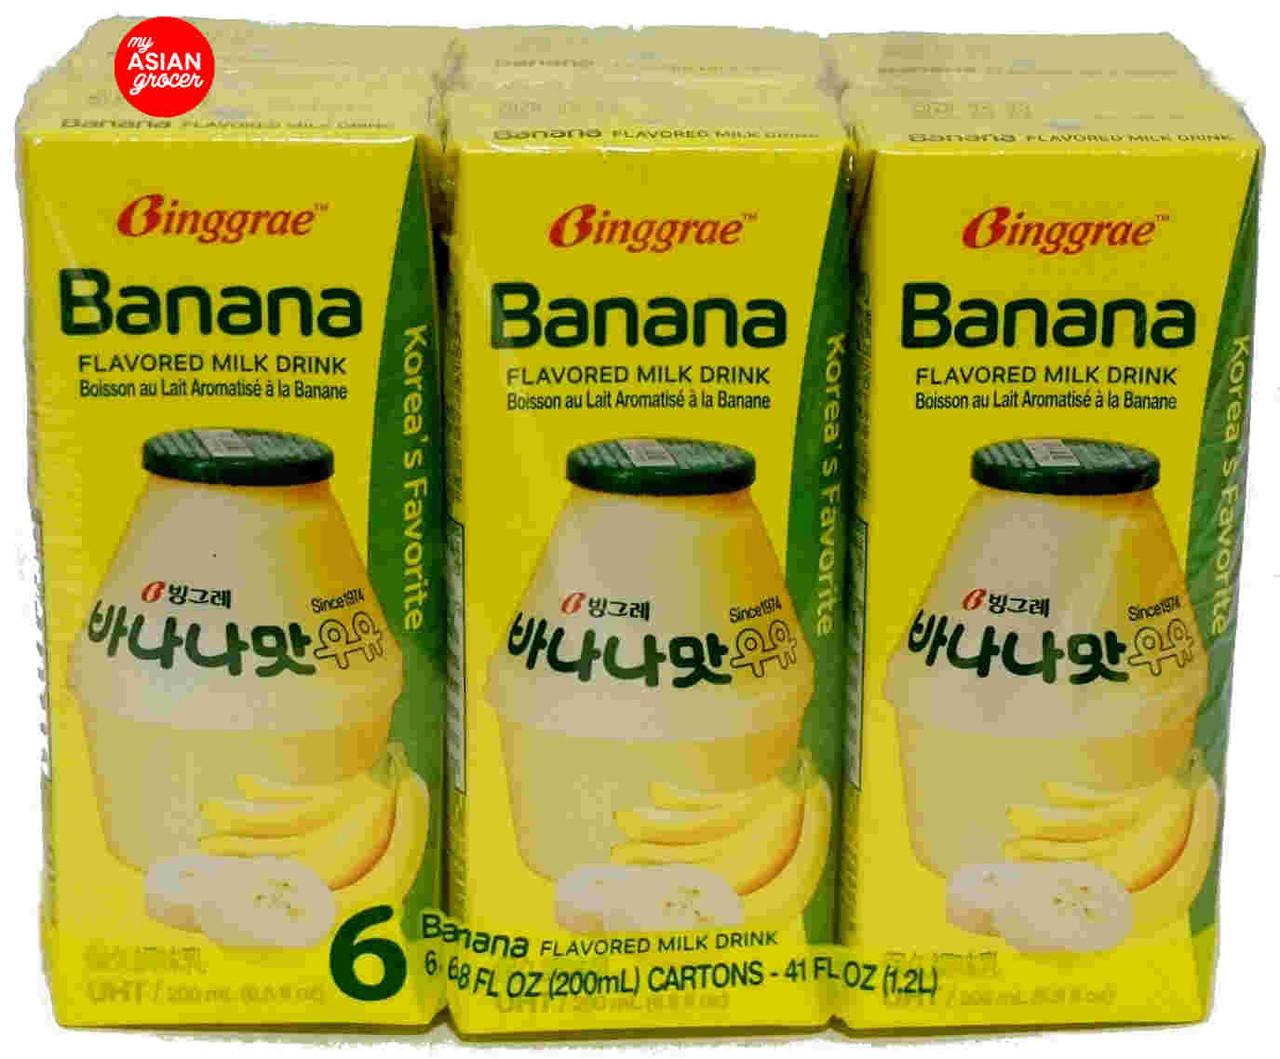 Binggrae Banana Flavored Milk Drink 200ml x 6 Pack